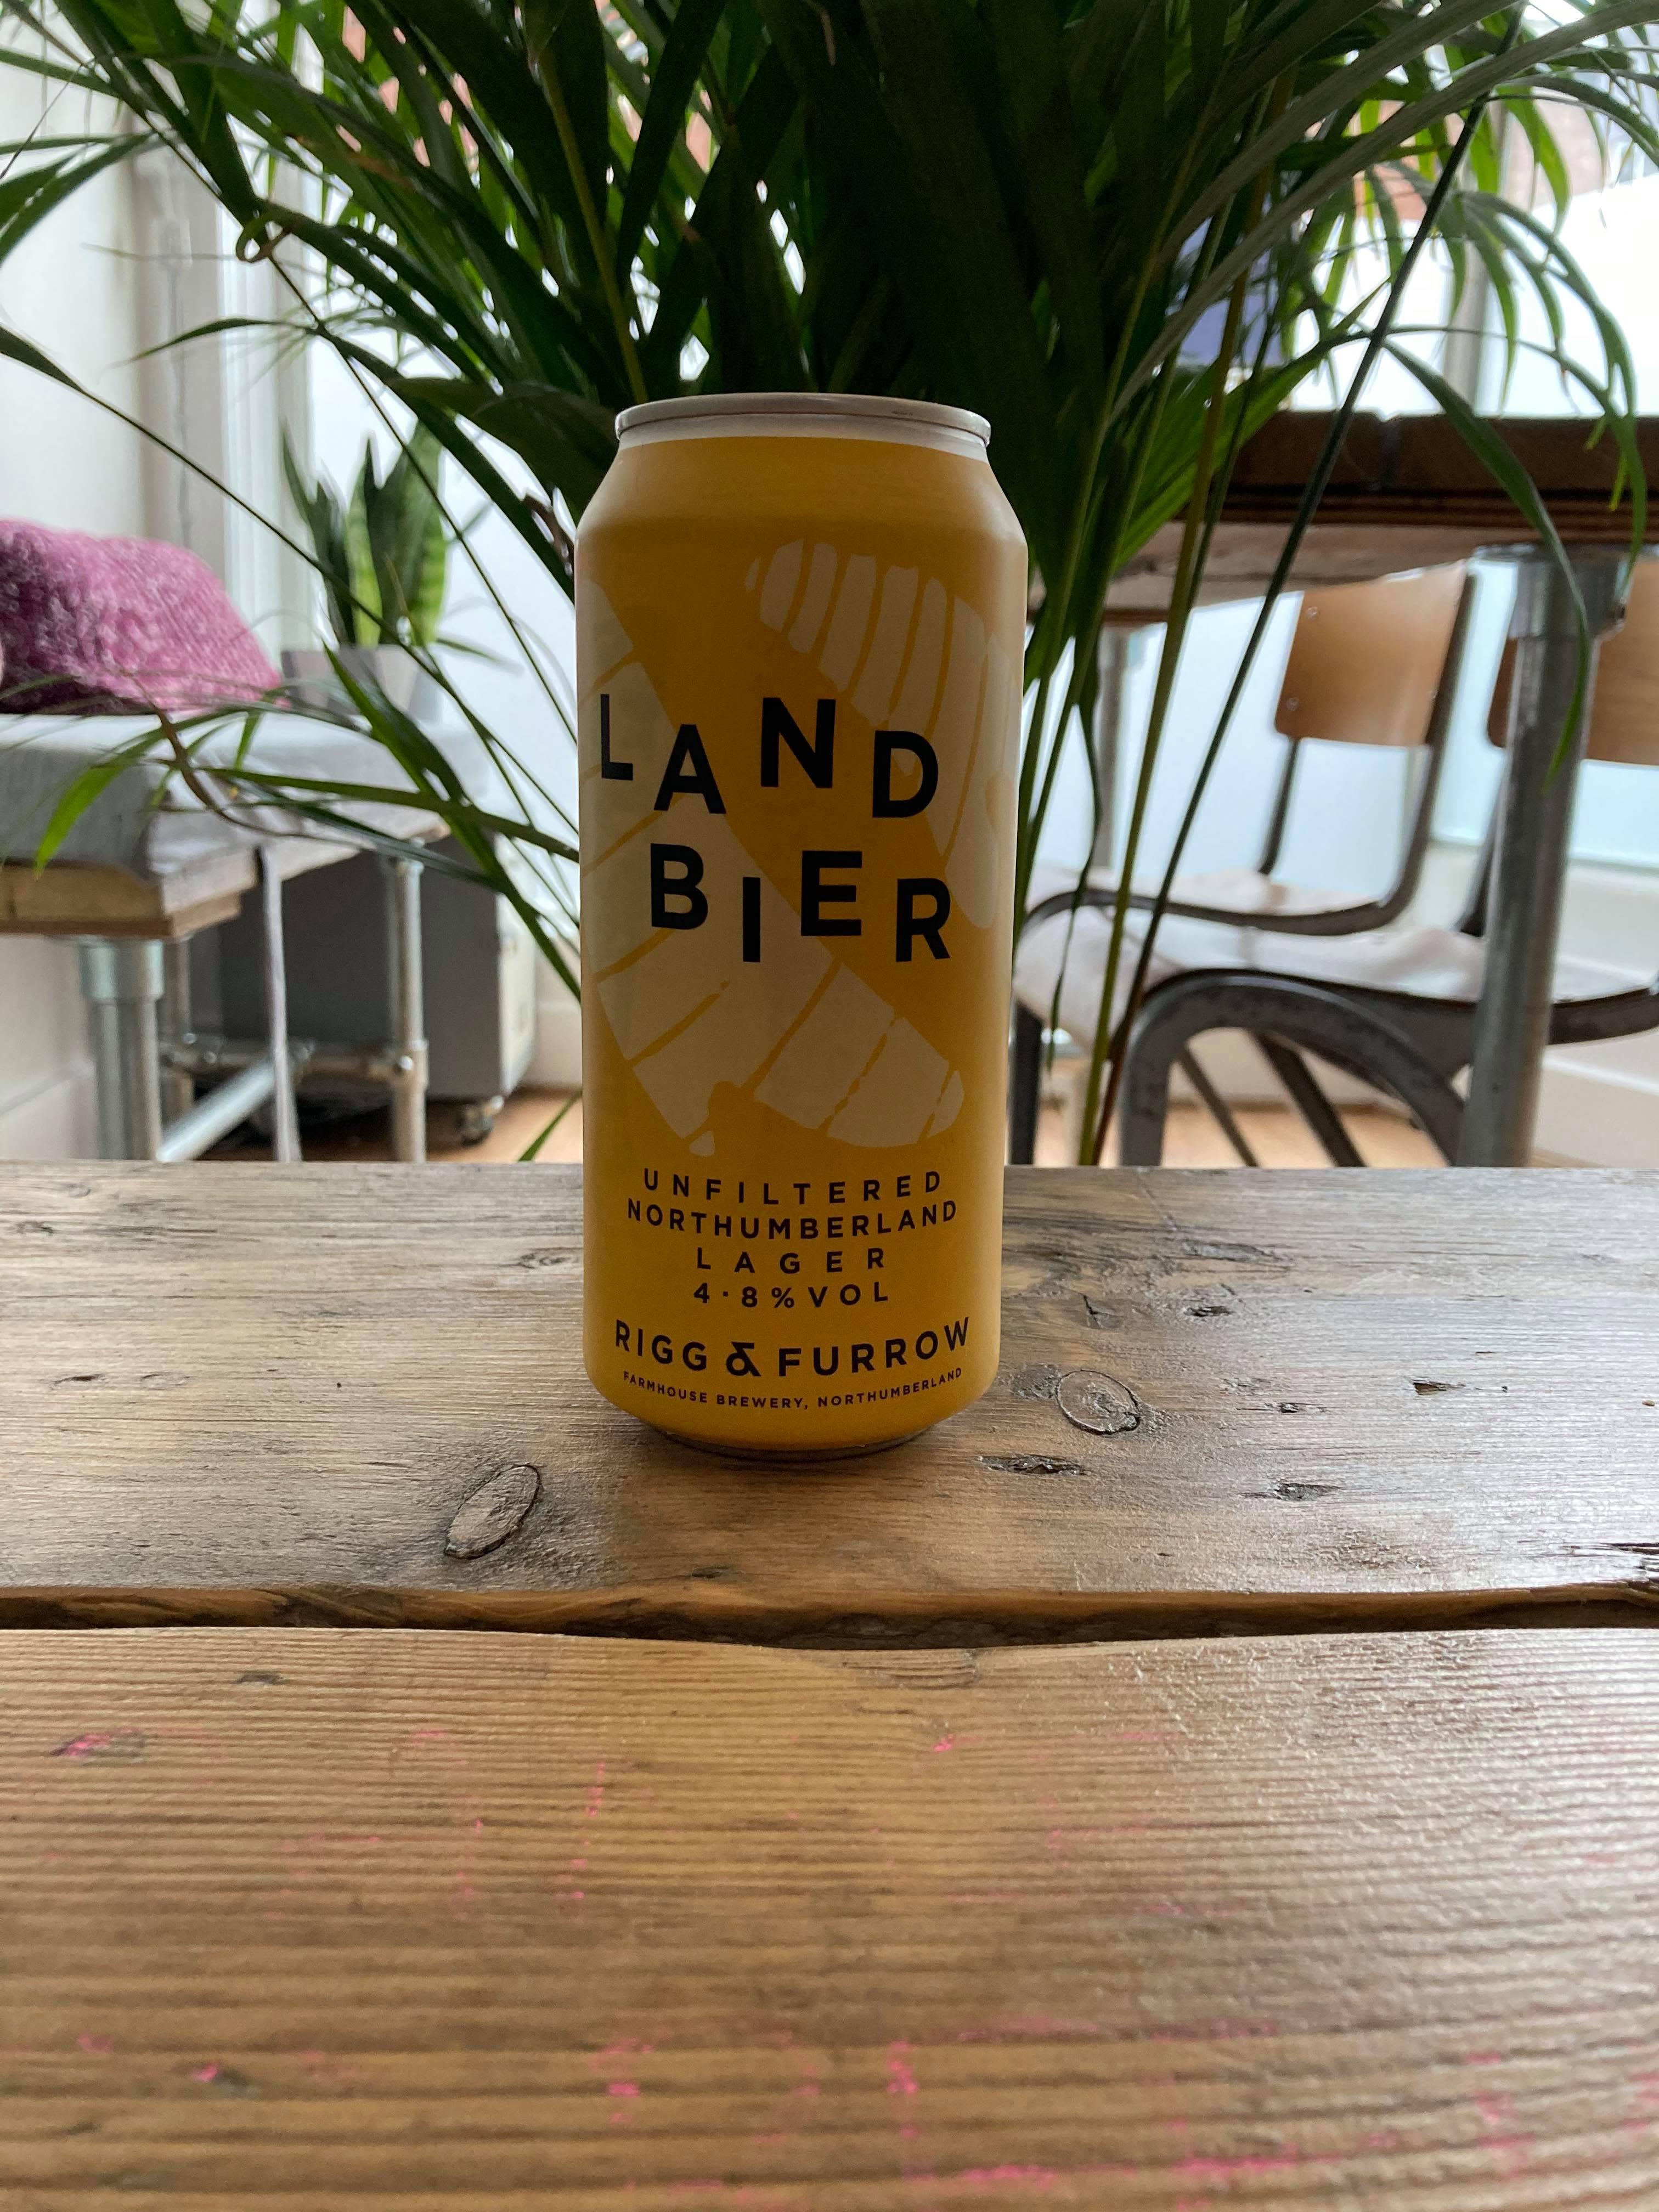 Rigg & Furrow - Land Bier 4.8%